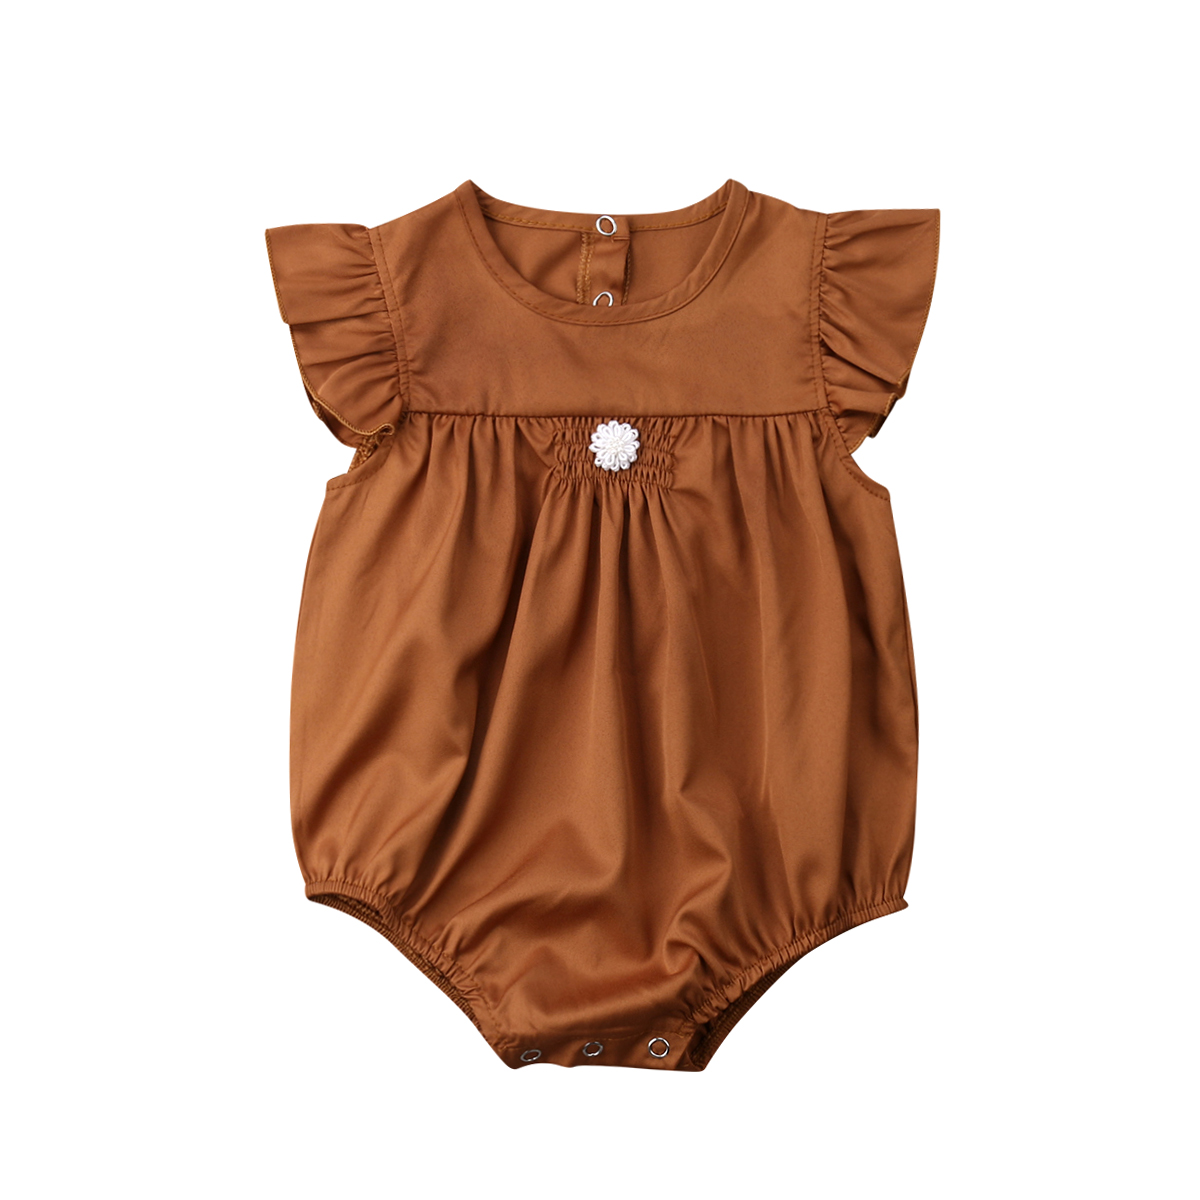 Summer Newborn Baby Girl Vintage Ruffle Romper Jumpsuit